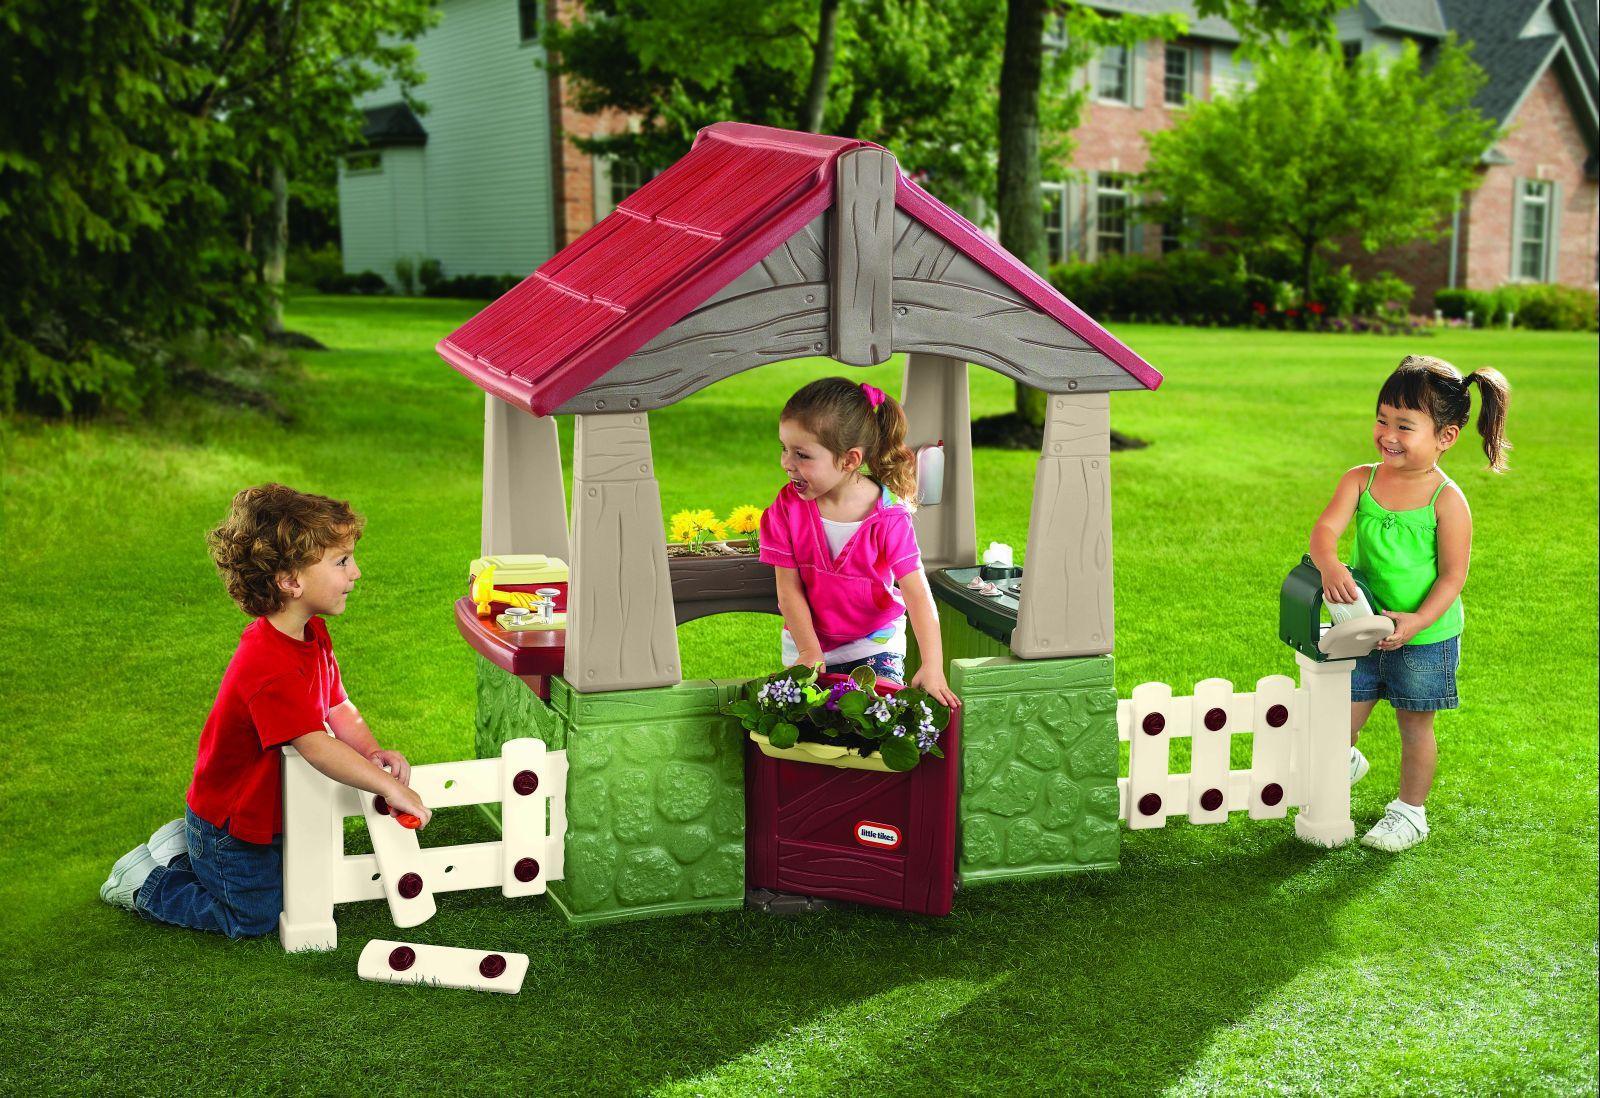 Little Tikes Home & Garden Playhouse Kids Toy in 2019